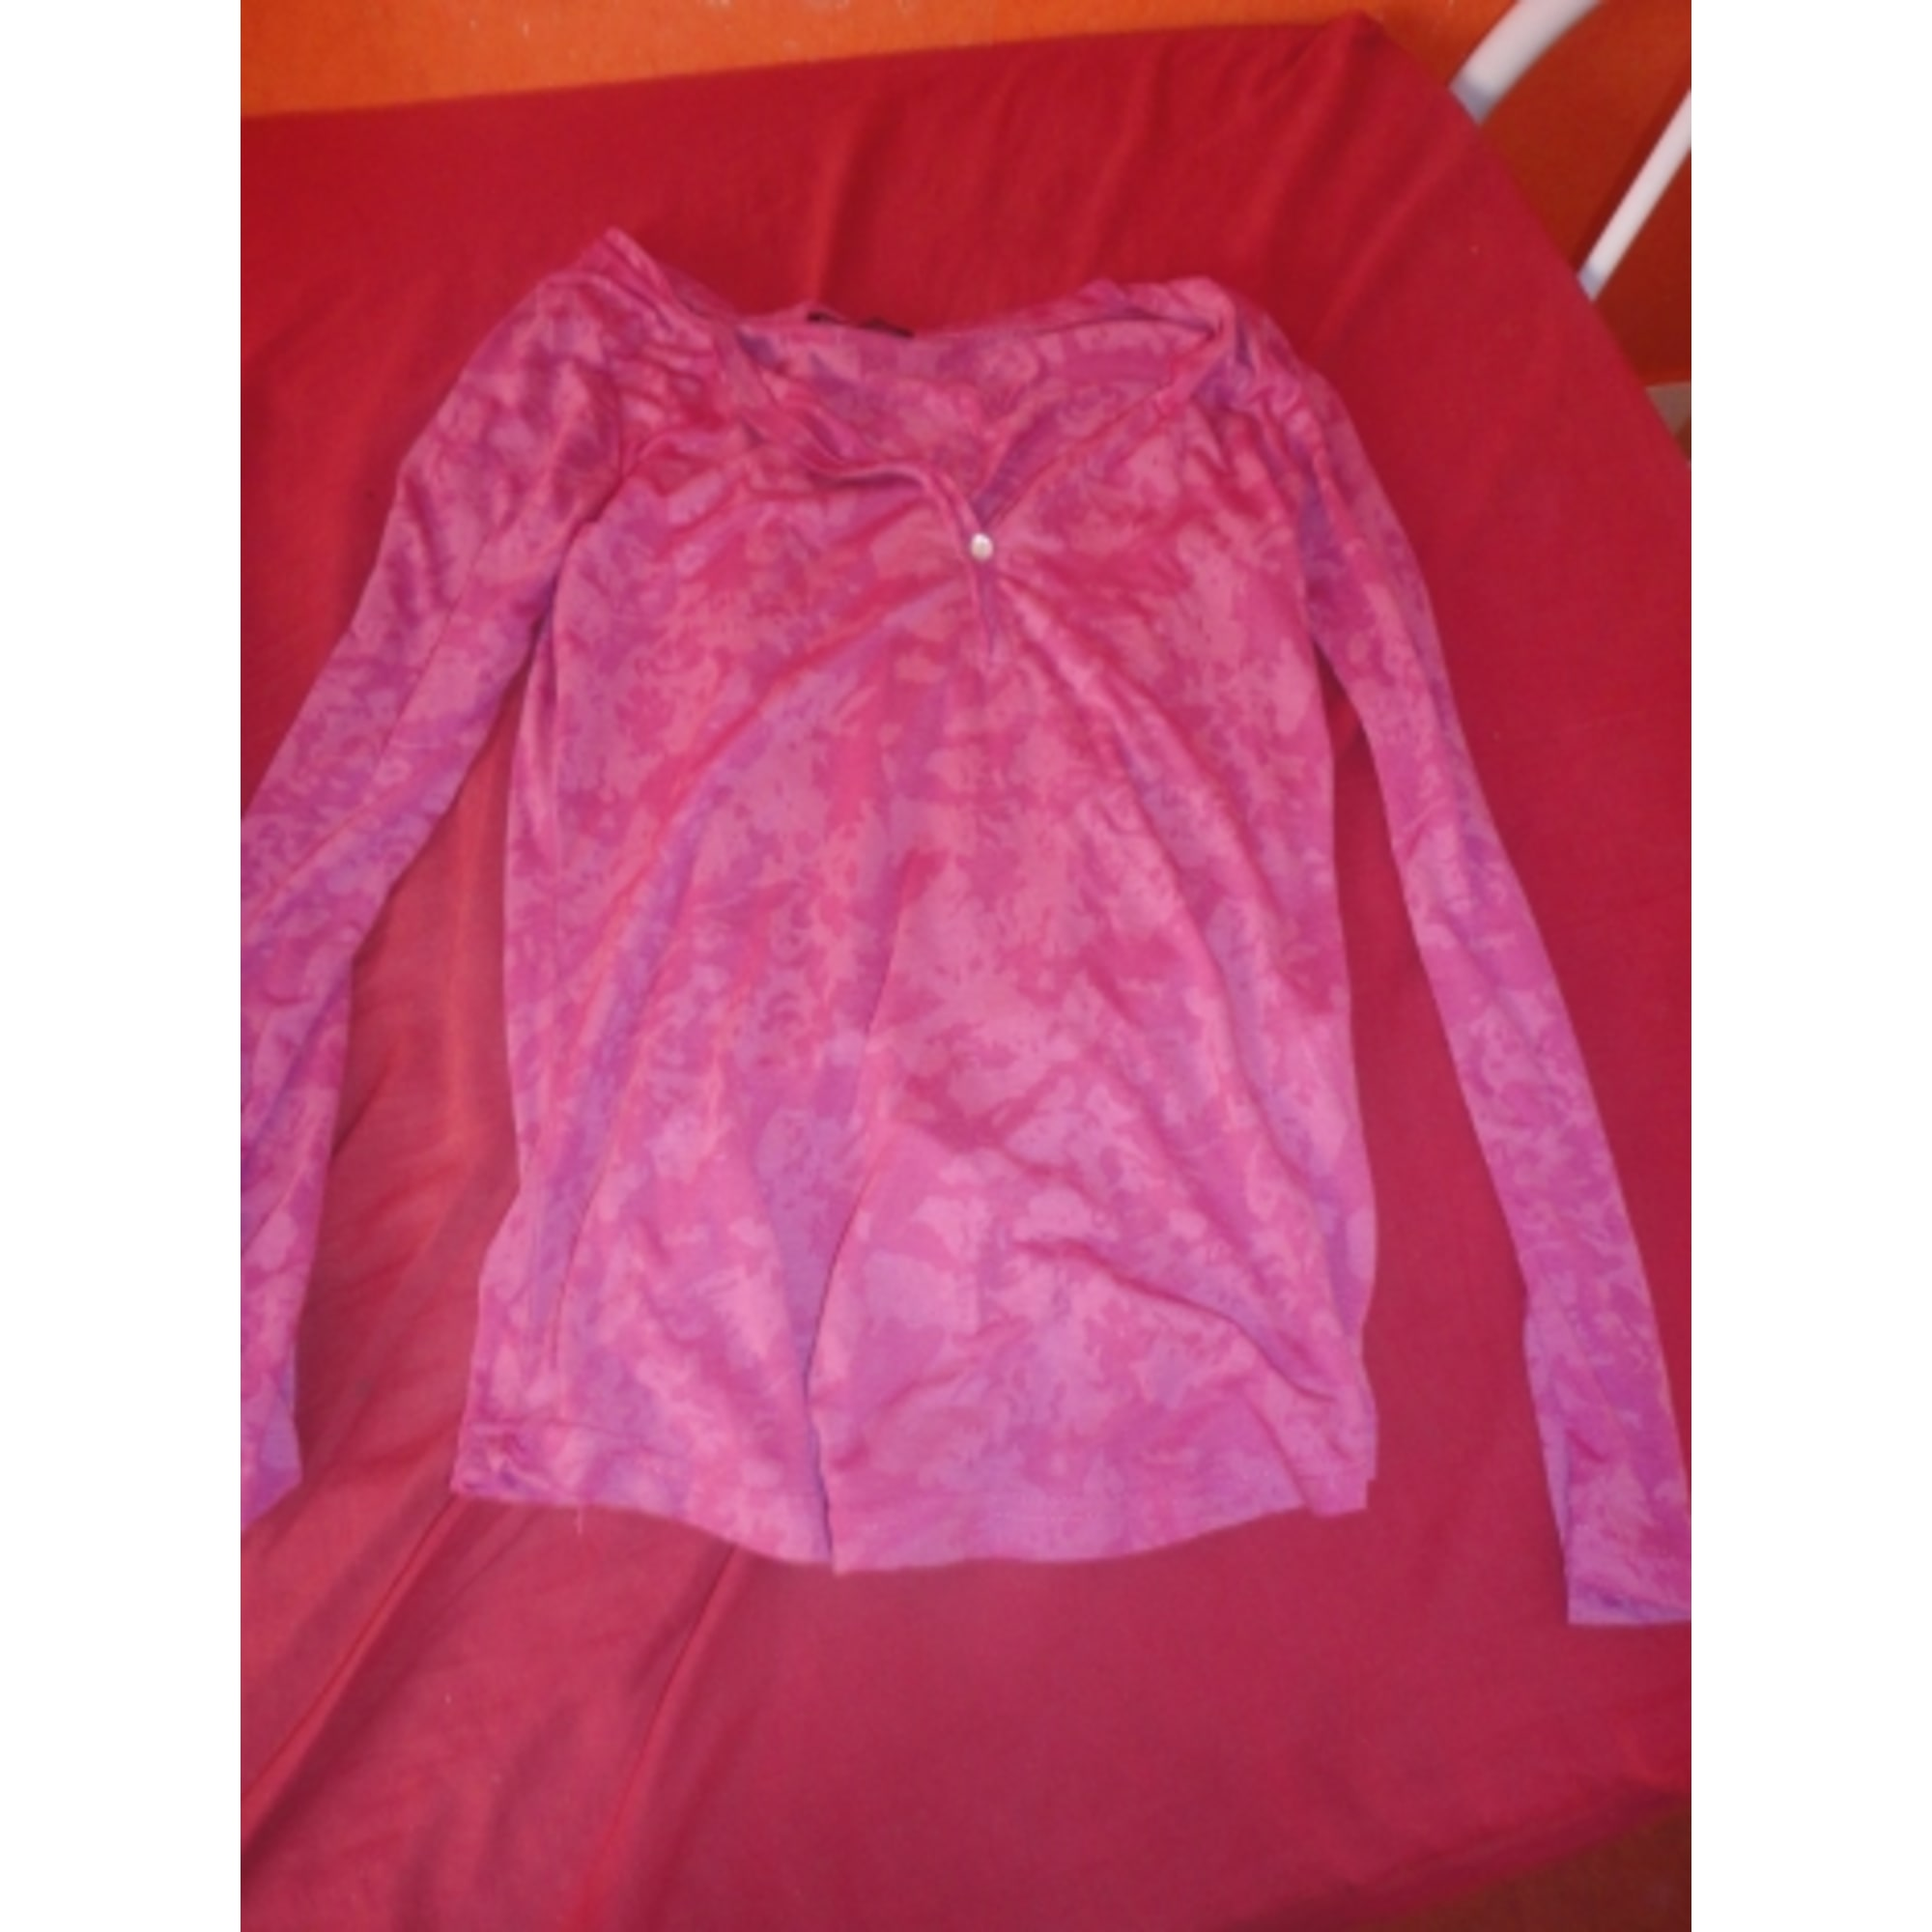 Top, tee-shirt 3 SUISSES Rose, fuschia, vieux rose